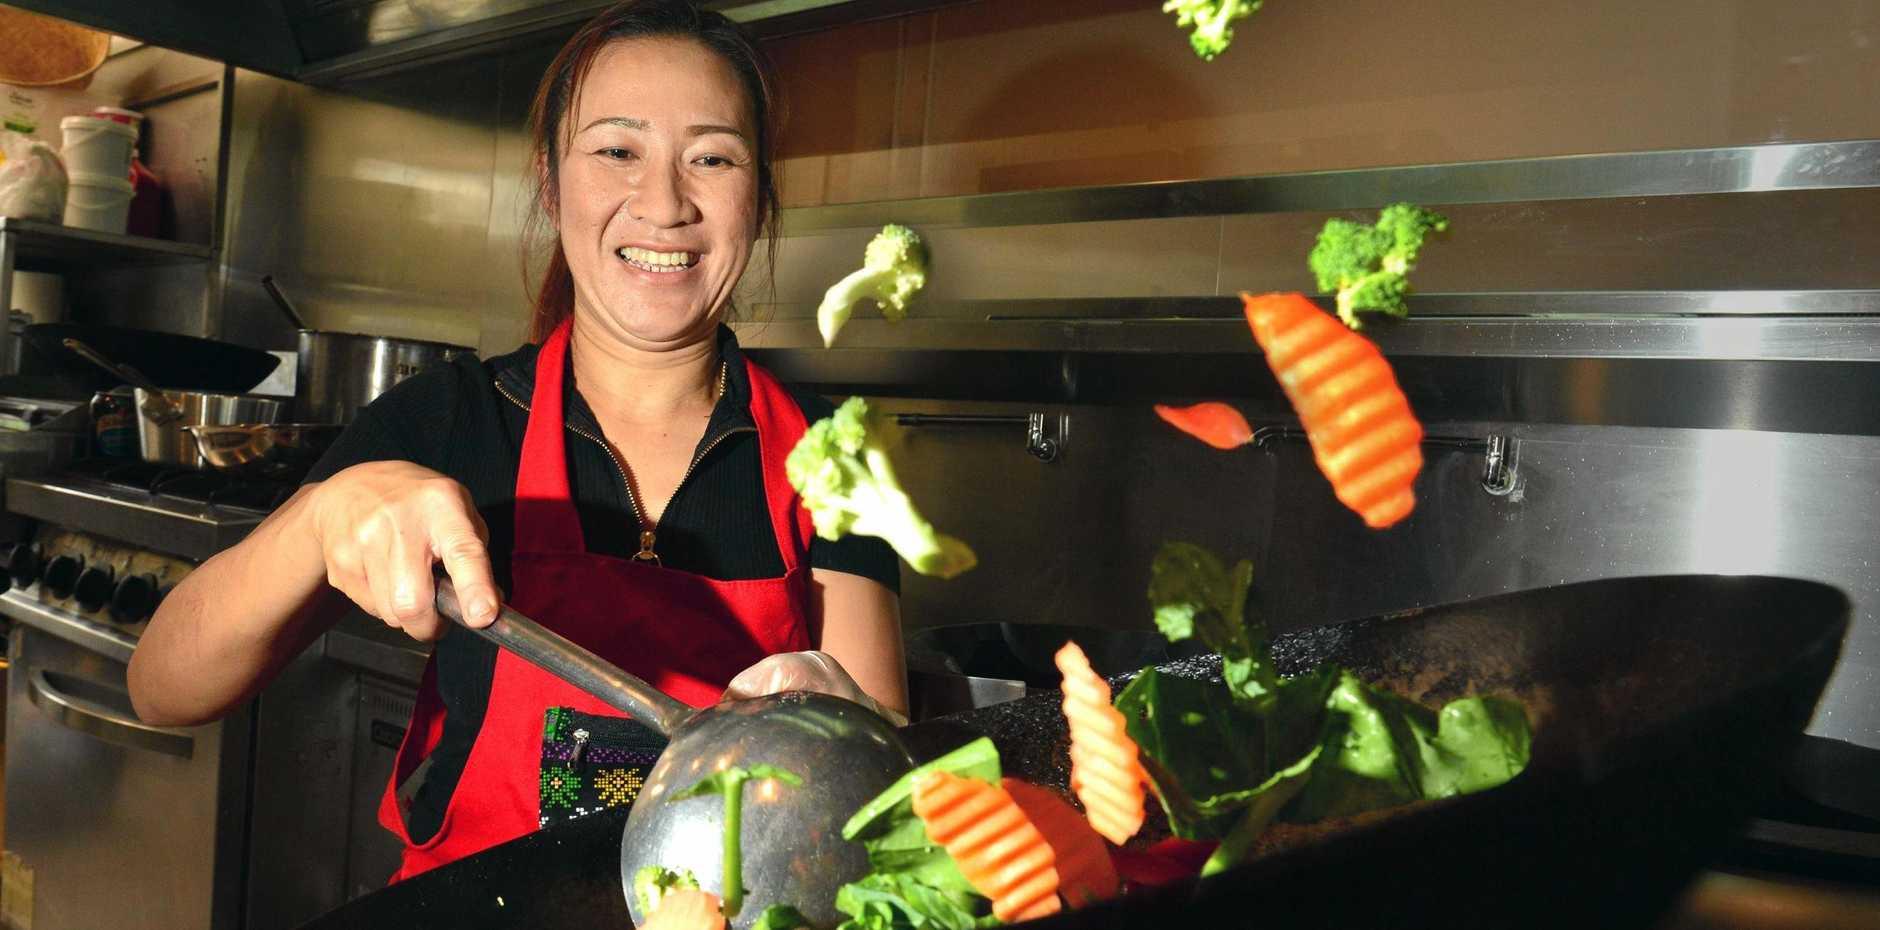 Rinda Tibkaeo of Muang Thai is back serving great family diishes in Mooloolah Valley.